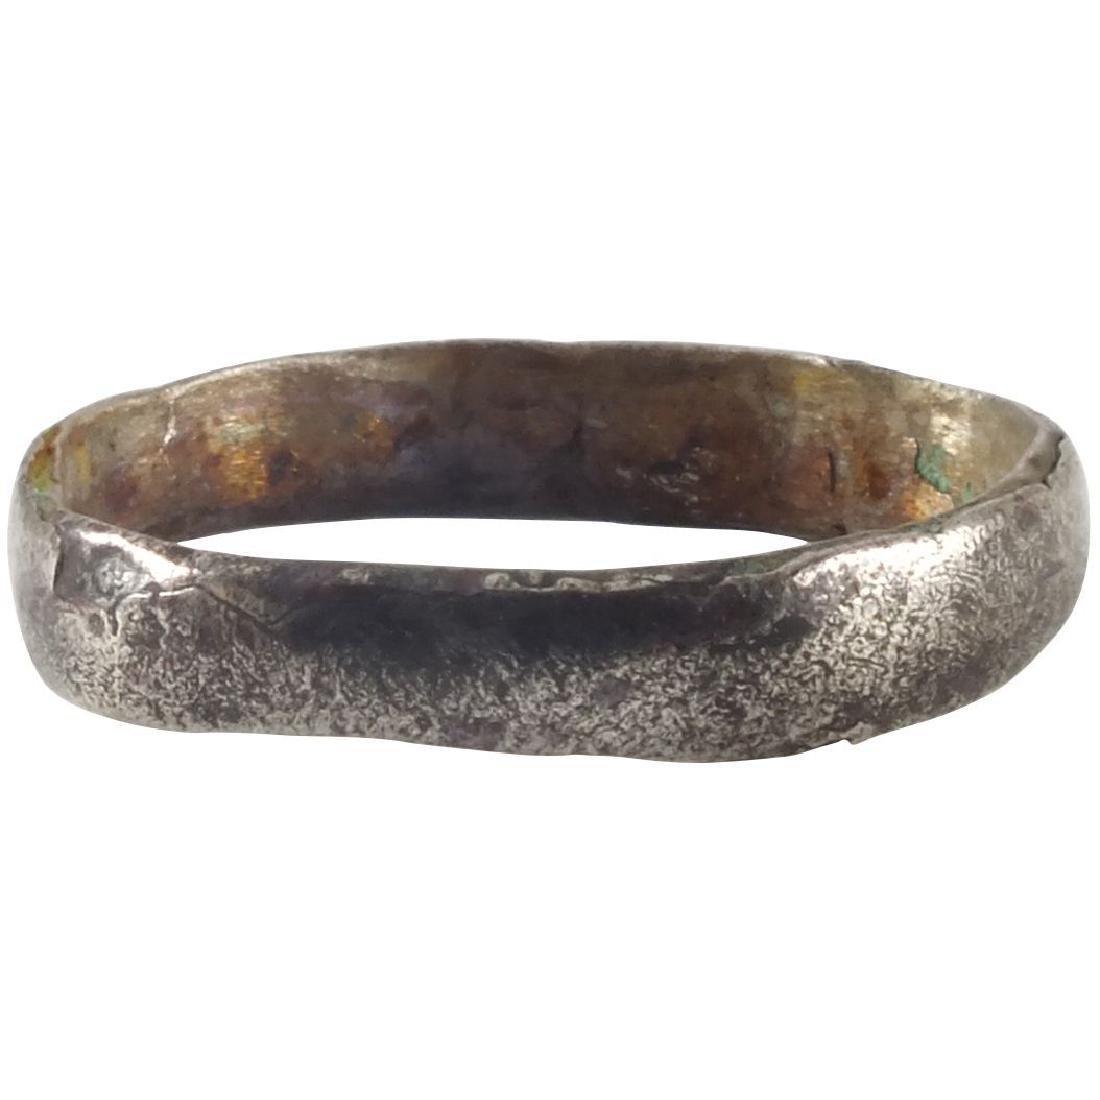 VIKING WOMAN'S WEDDING RING, 866-1067 AD